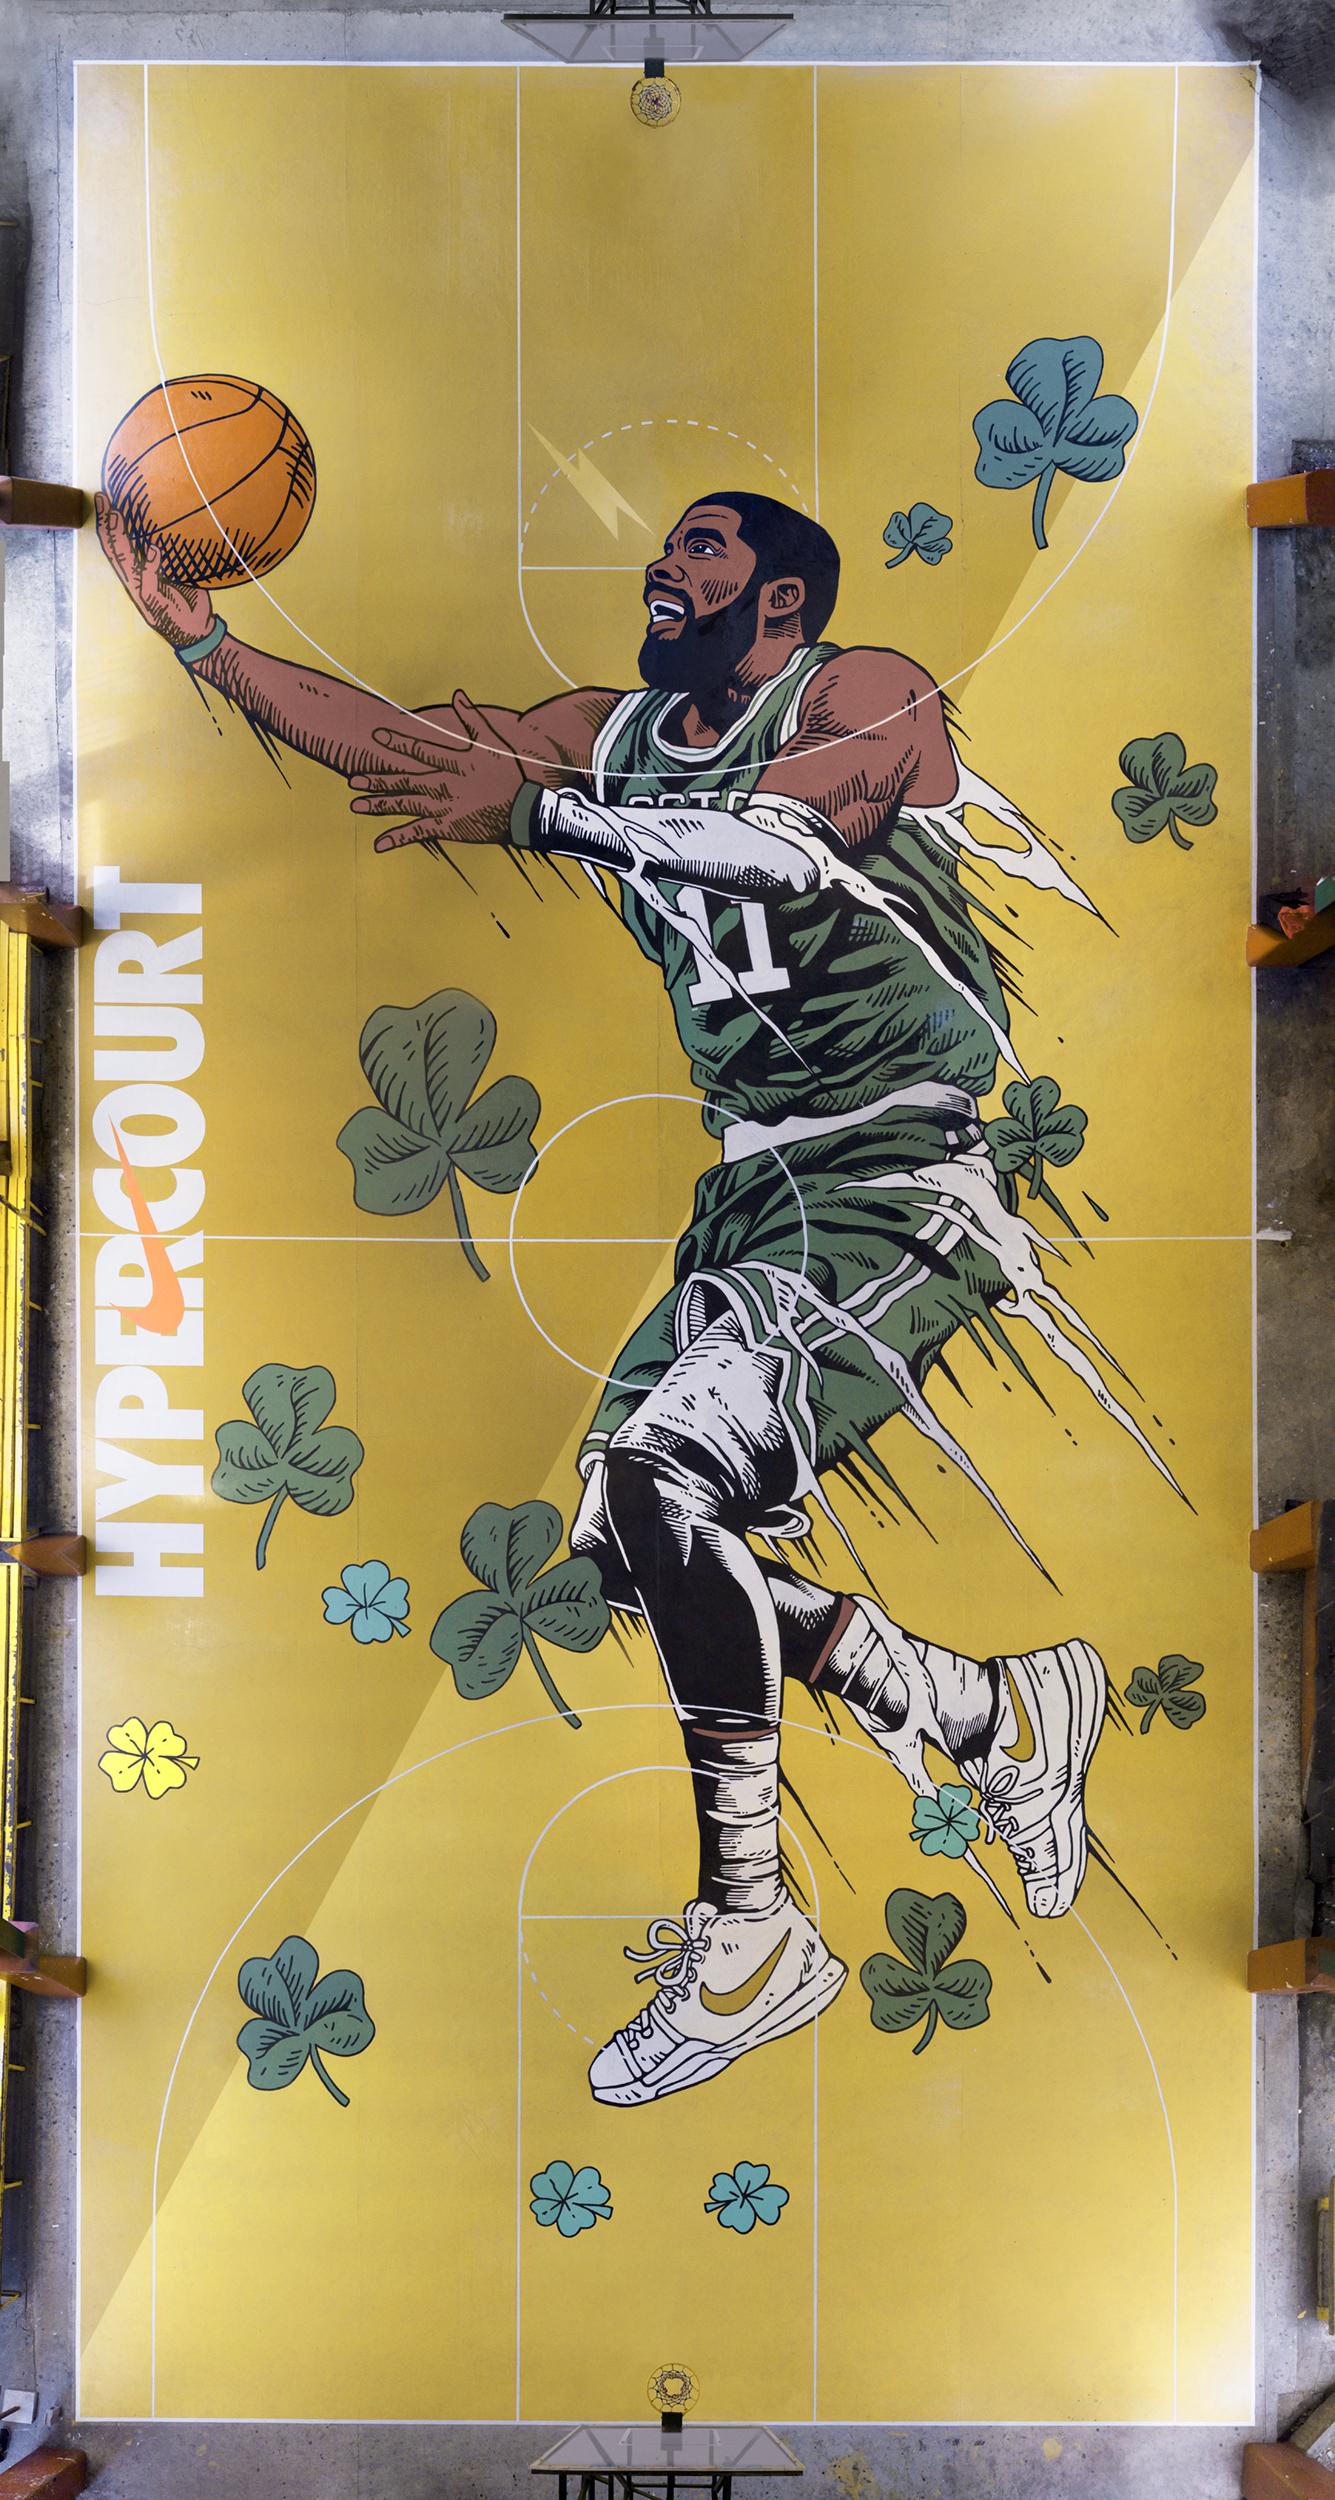 David Lee Basketball >> Nike Hyper Court: Mixing Art and Basketball in Manila - BuhayBasket